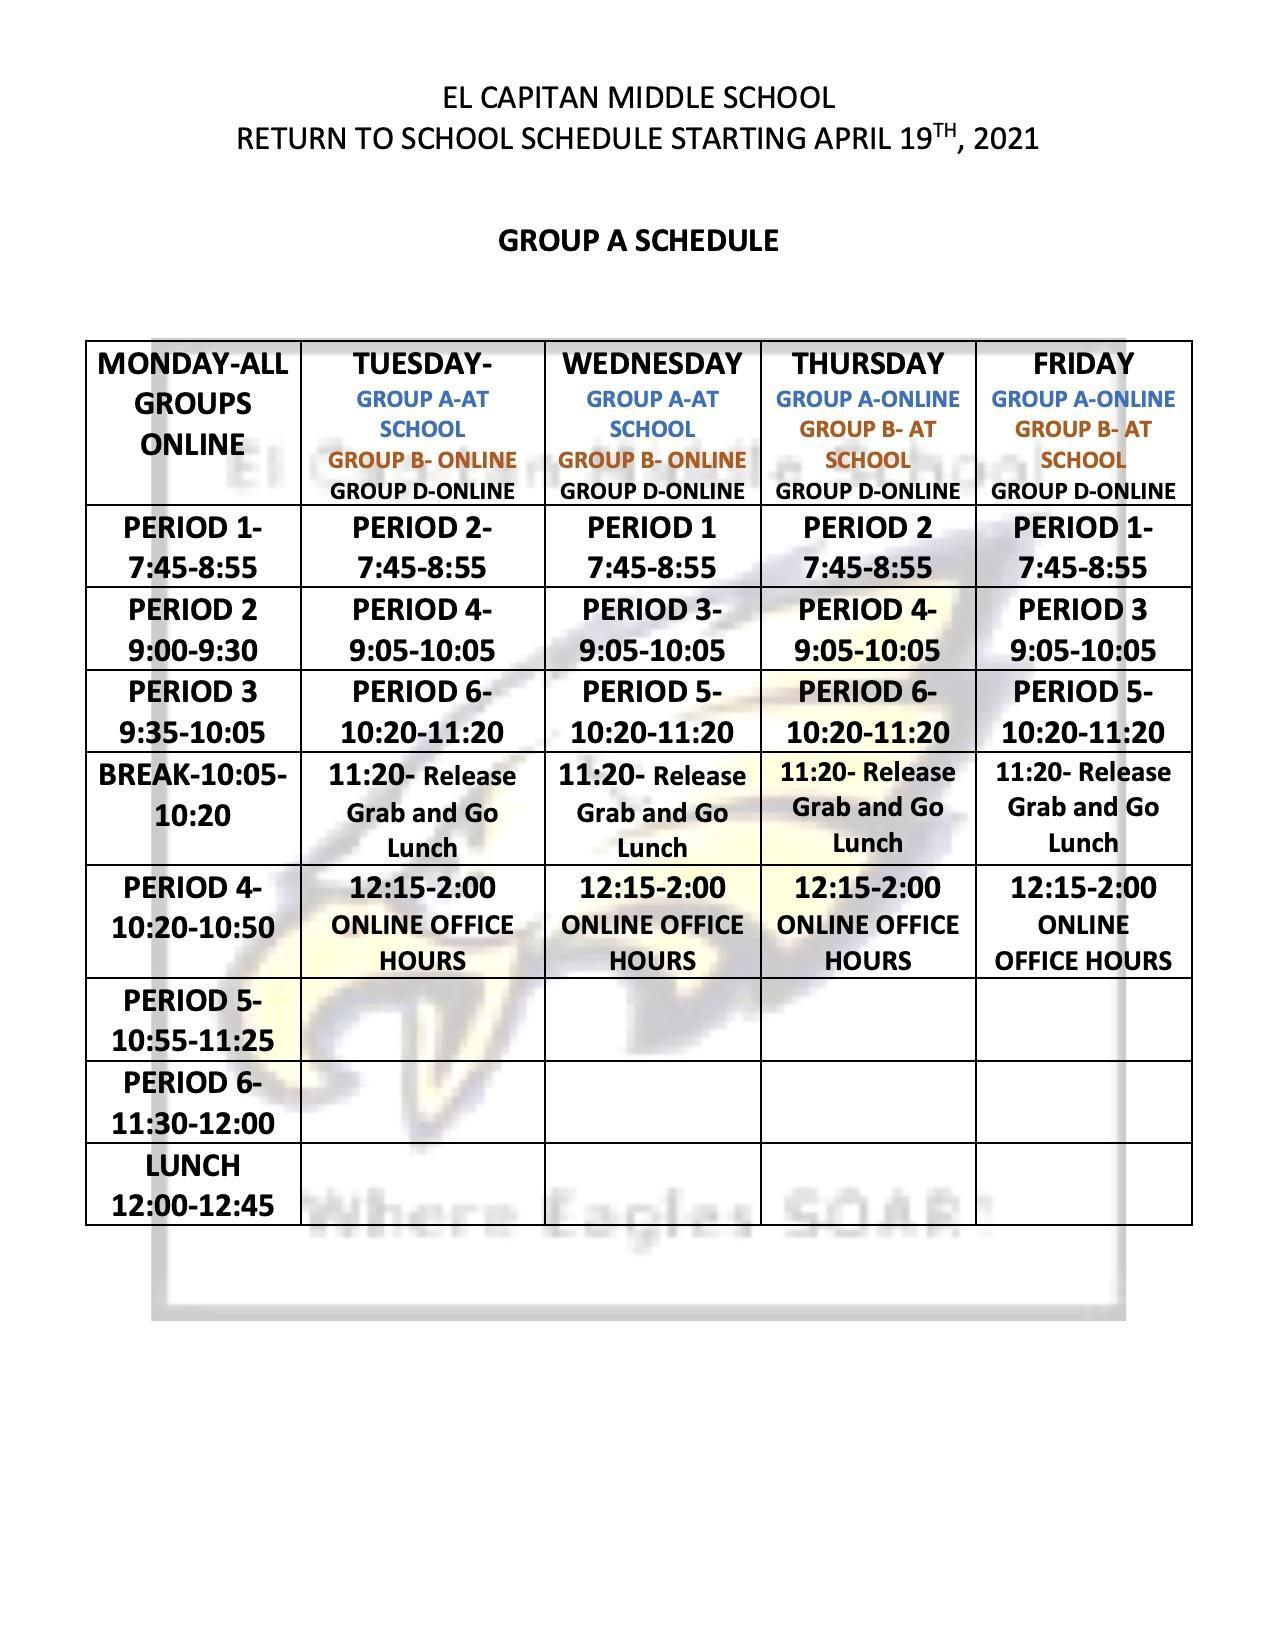 Return to School Schedule Starting April 19, 2021